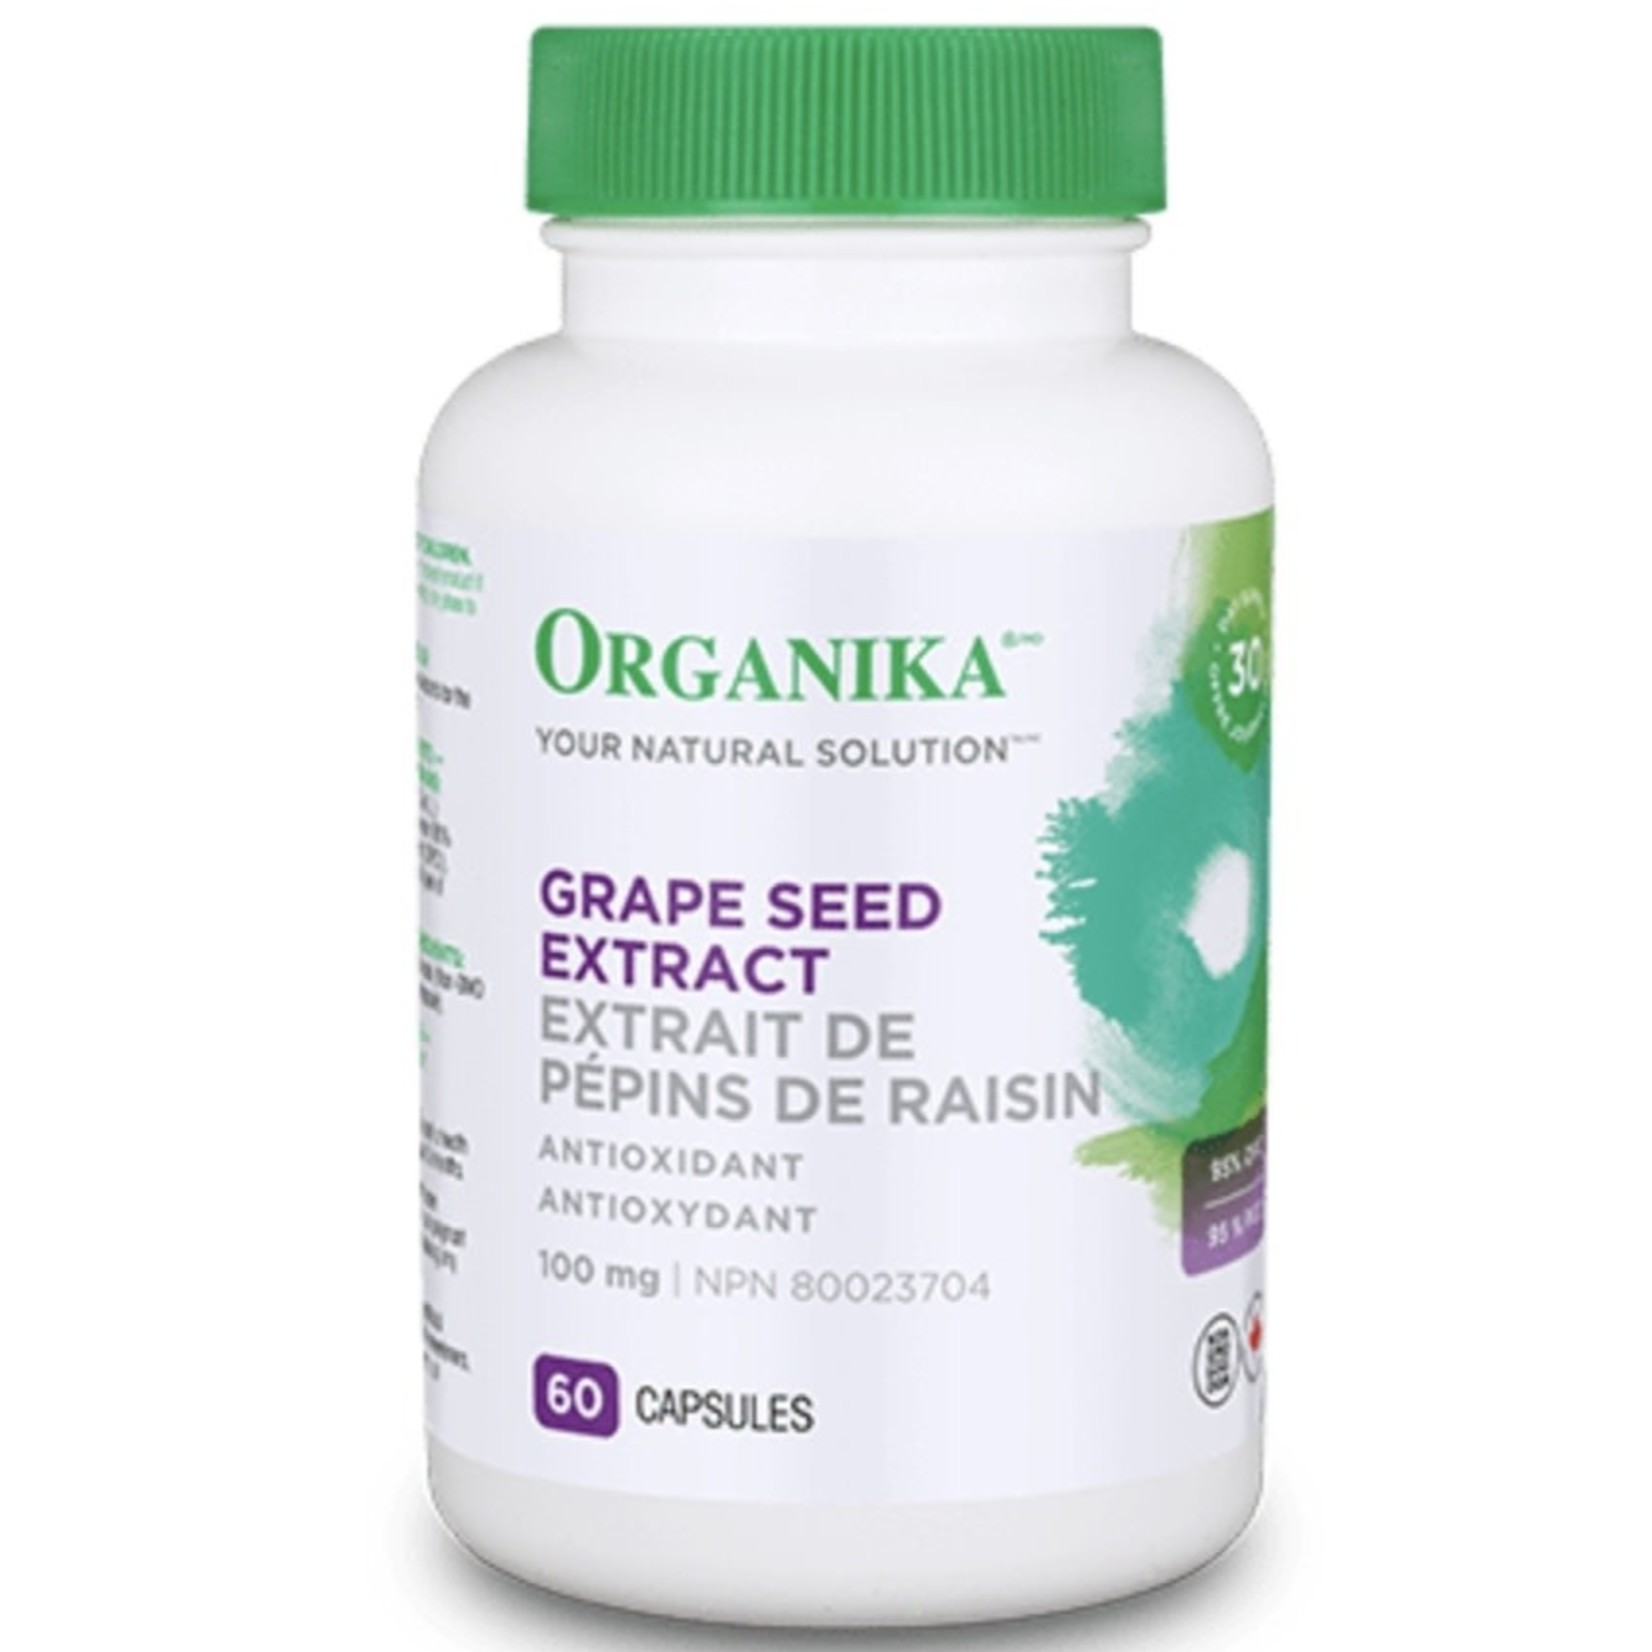 Organika Organika Grape Seed Extract 100mg 60 caps